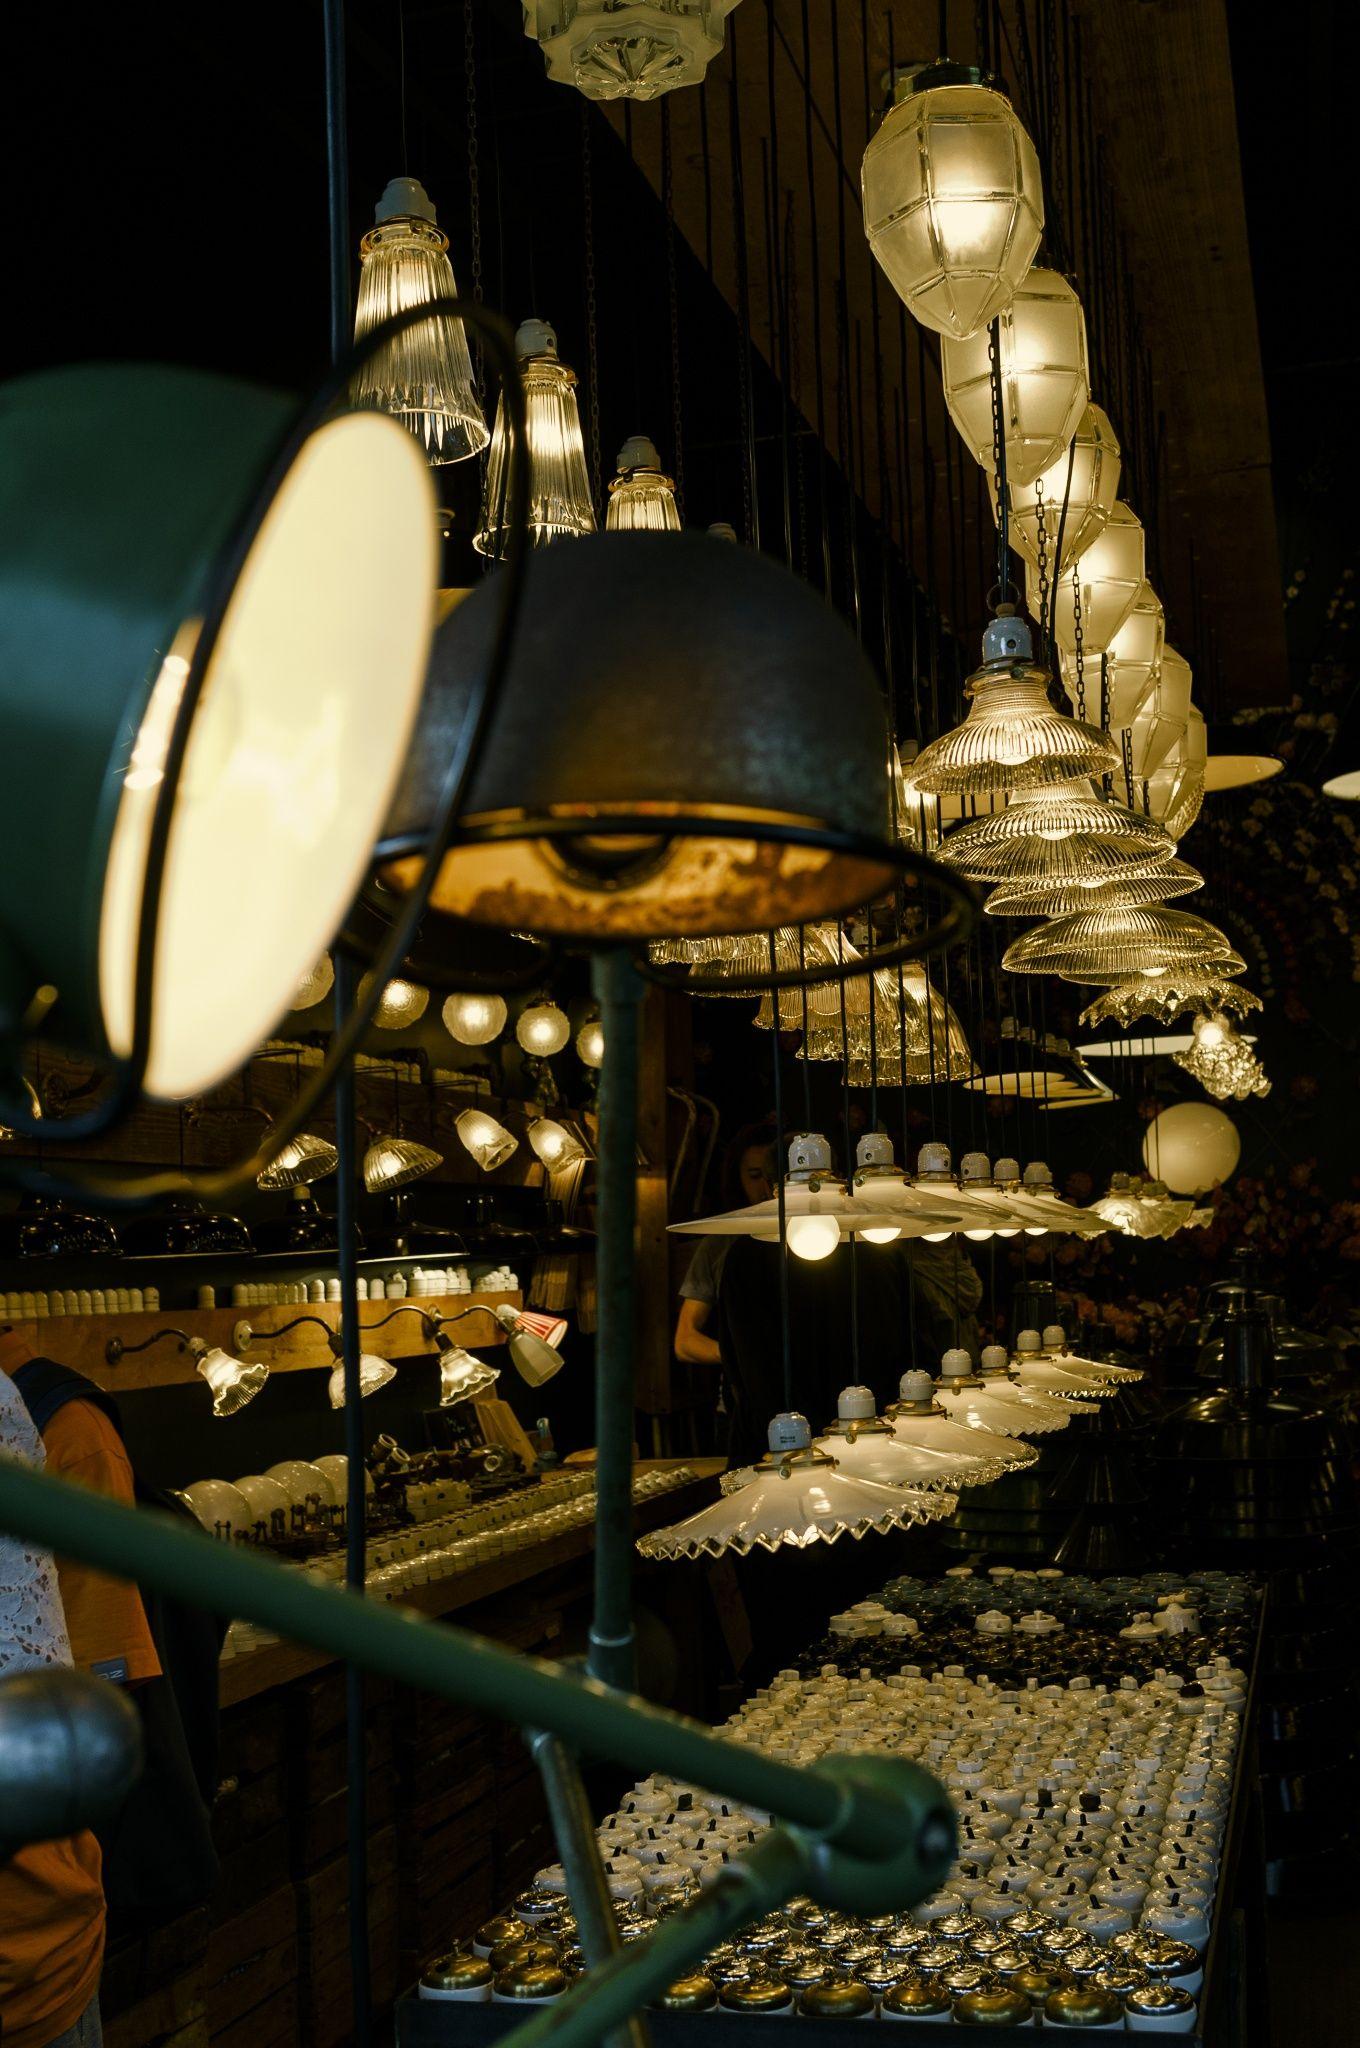 light store by Marcio Fischer on 500px